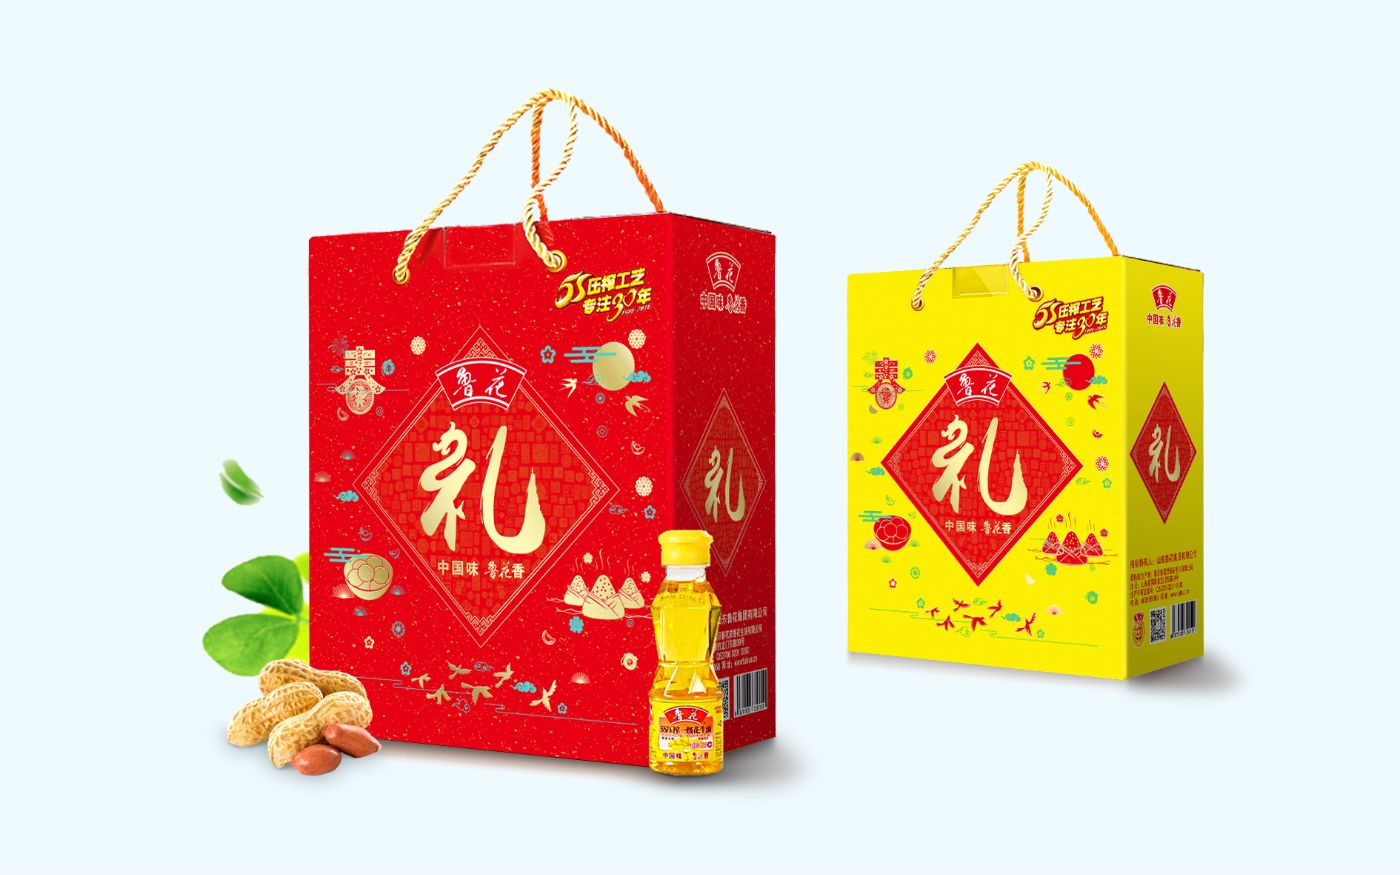 魯花品牌<a href='http://www.6bubu.com/service/baozhuangsheji/' title='' style='color:;font-weight:bold'>包裝設計</a>02.jpg